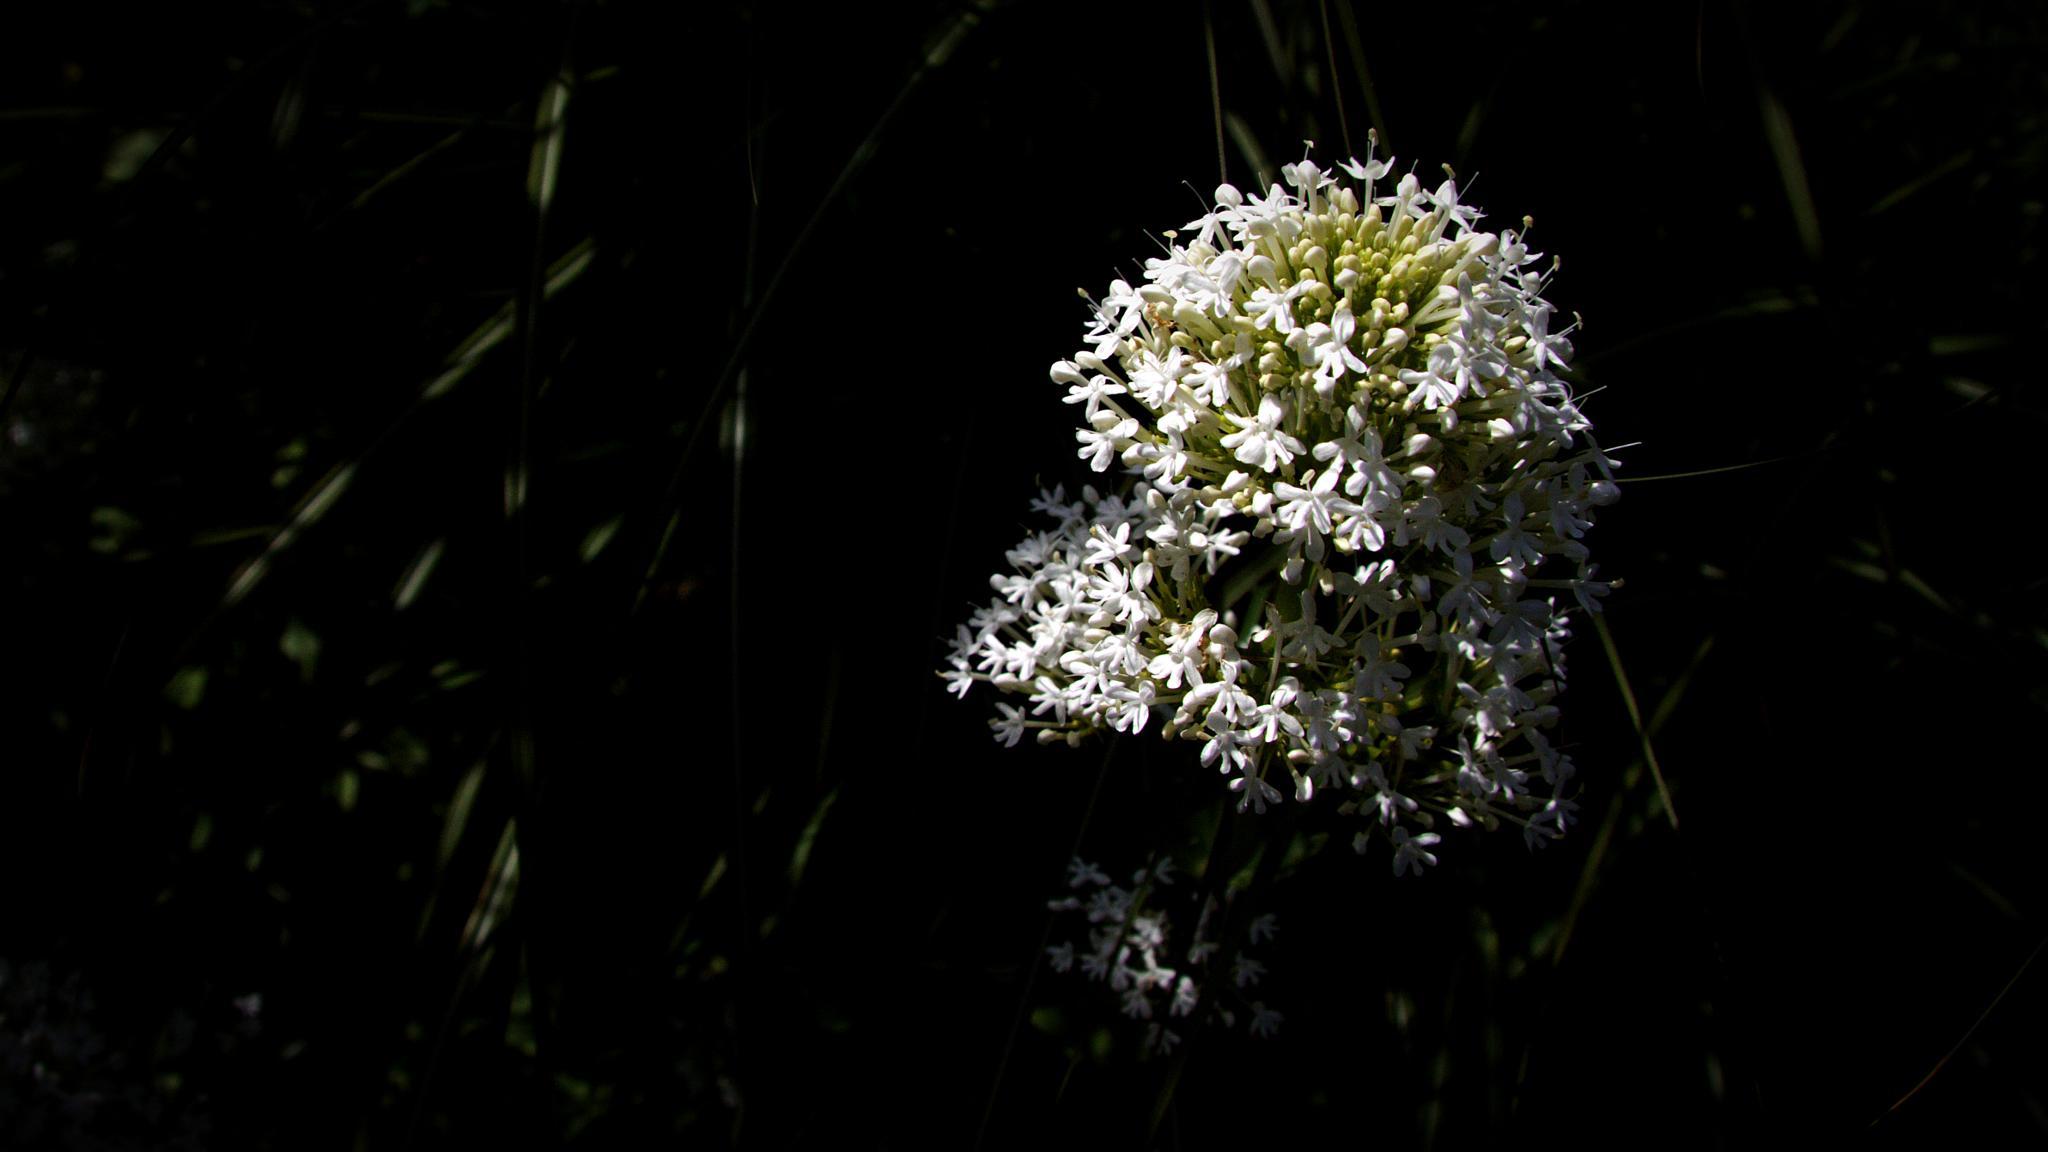 Just A Photograph 266 by Dorian Stretton